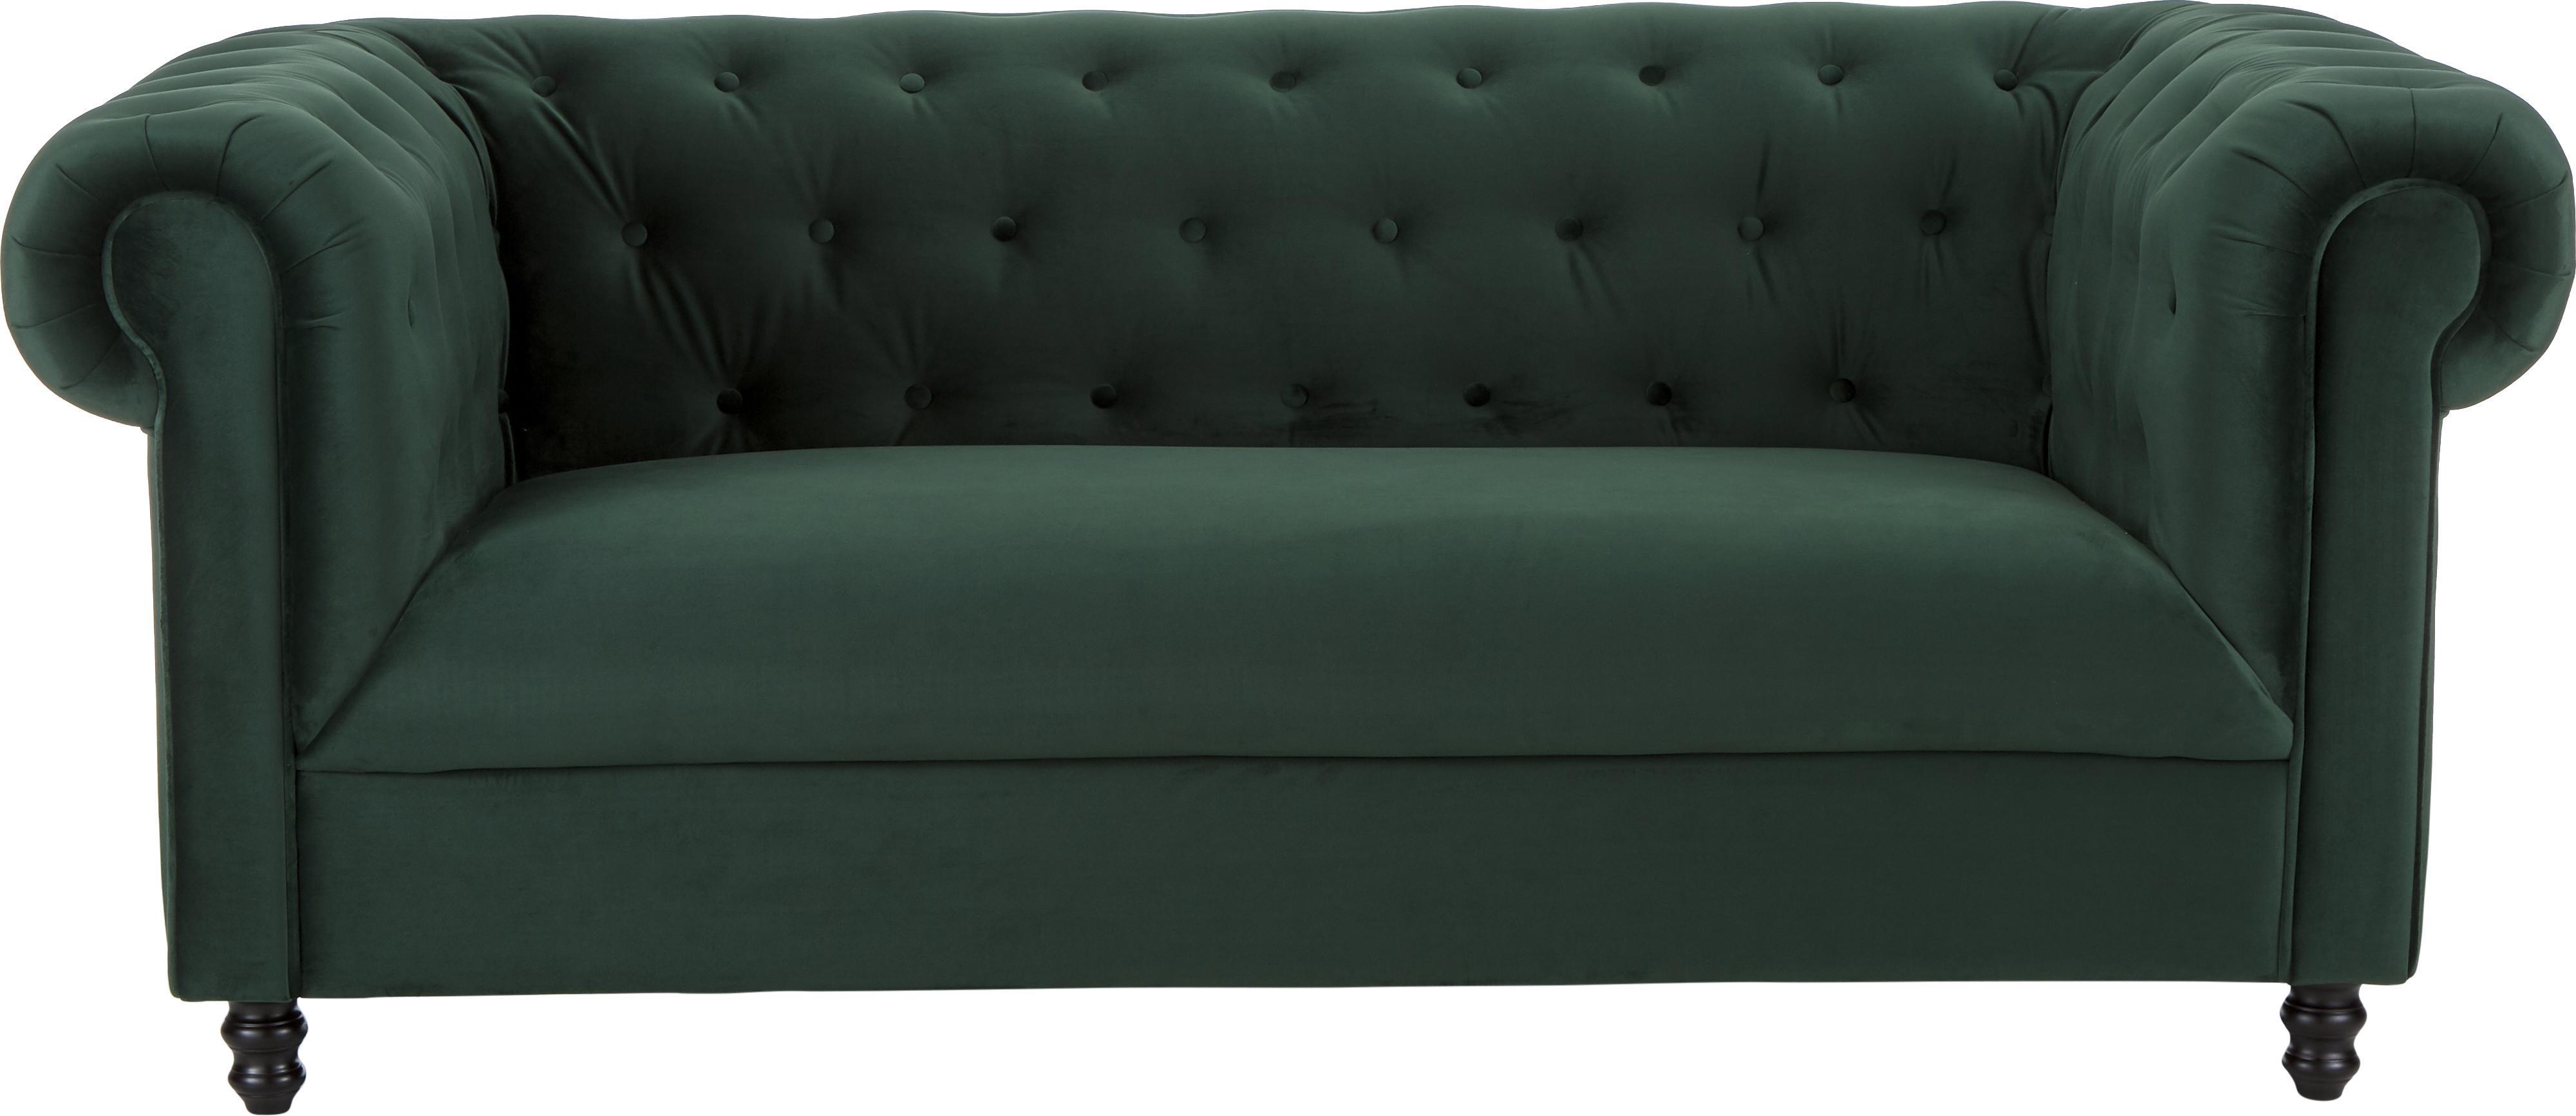 Fluwelen Chesterfield bank Chester (2-zits), Bekleding: polyester fluweel 20.000 , Poten: massief eikenhout en gela, Fluweel bosgroen, 186 x 94 cm